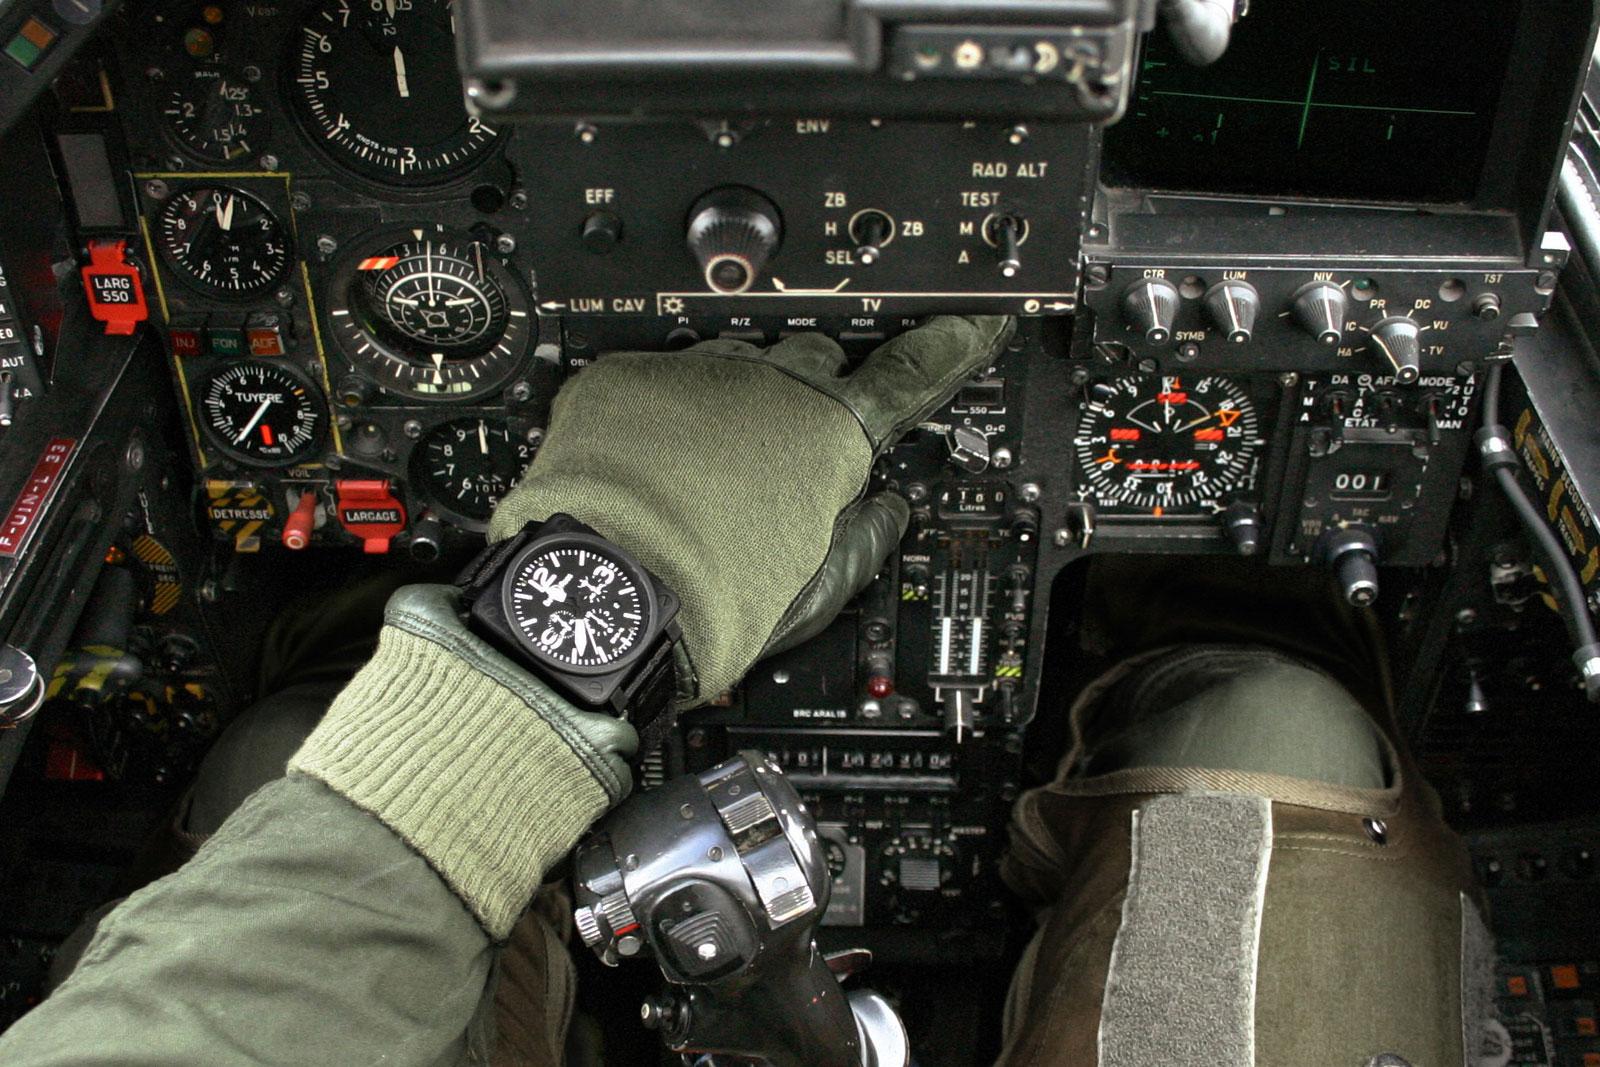 Bell & Ross cockpit